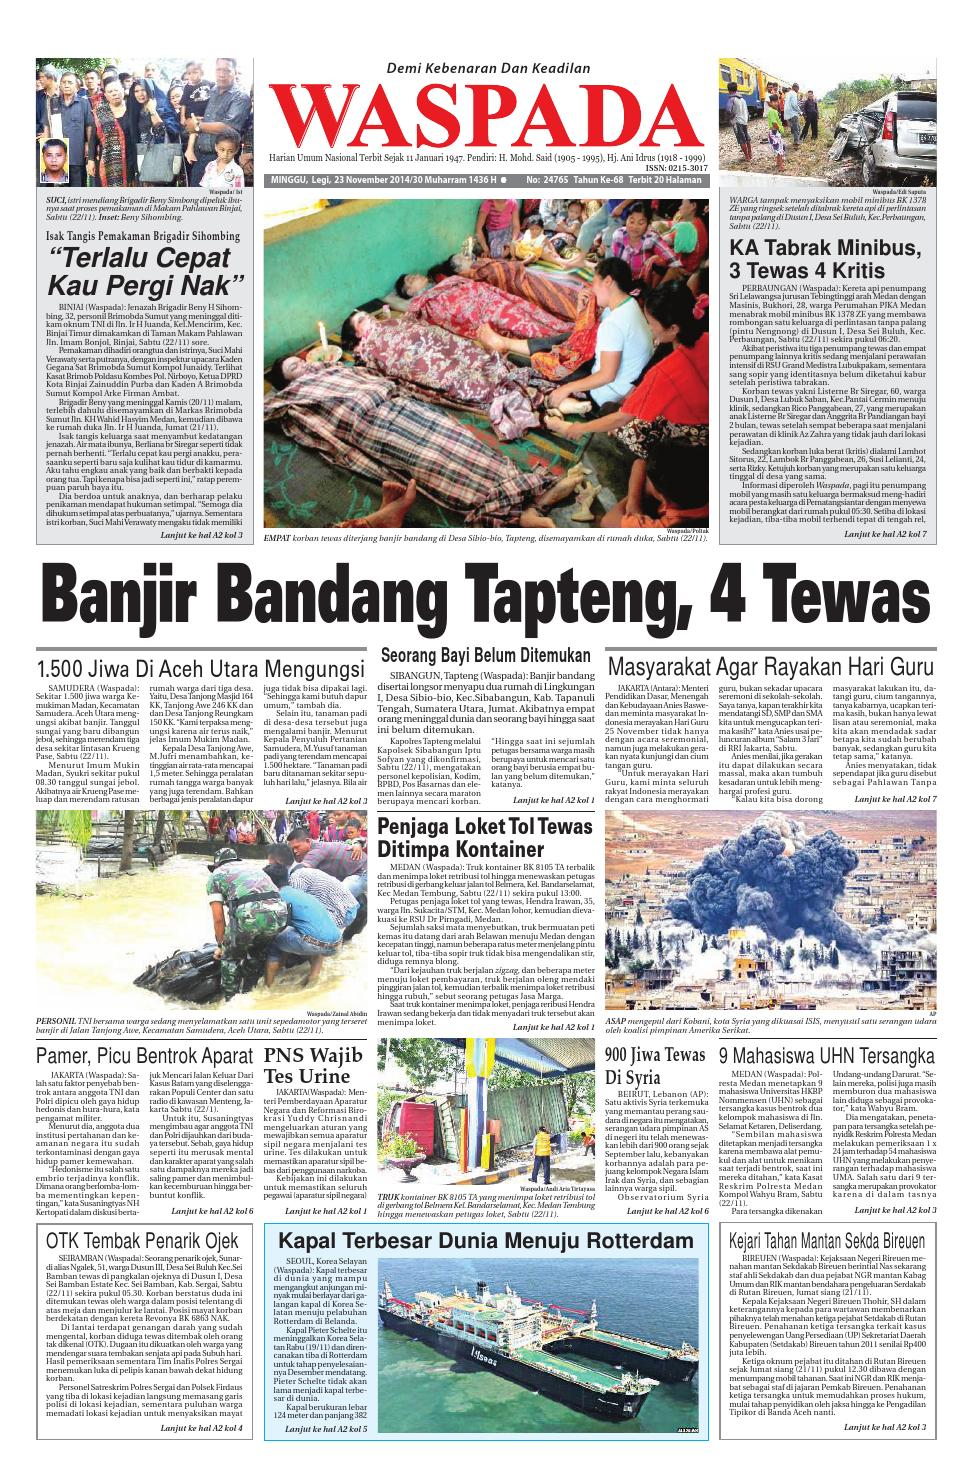 Waspada Minggu 23 November 2014 By Harian Waspada Issuu